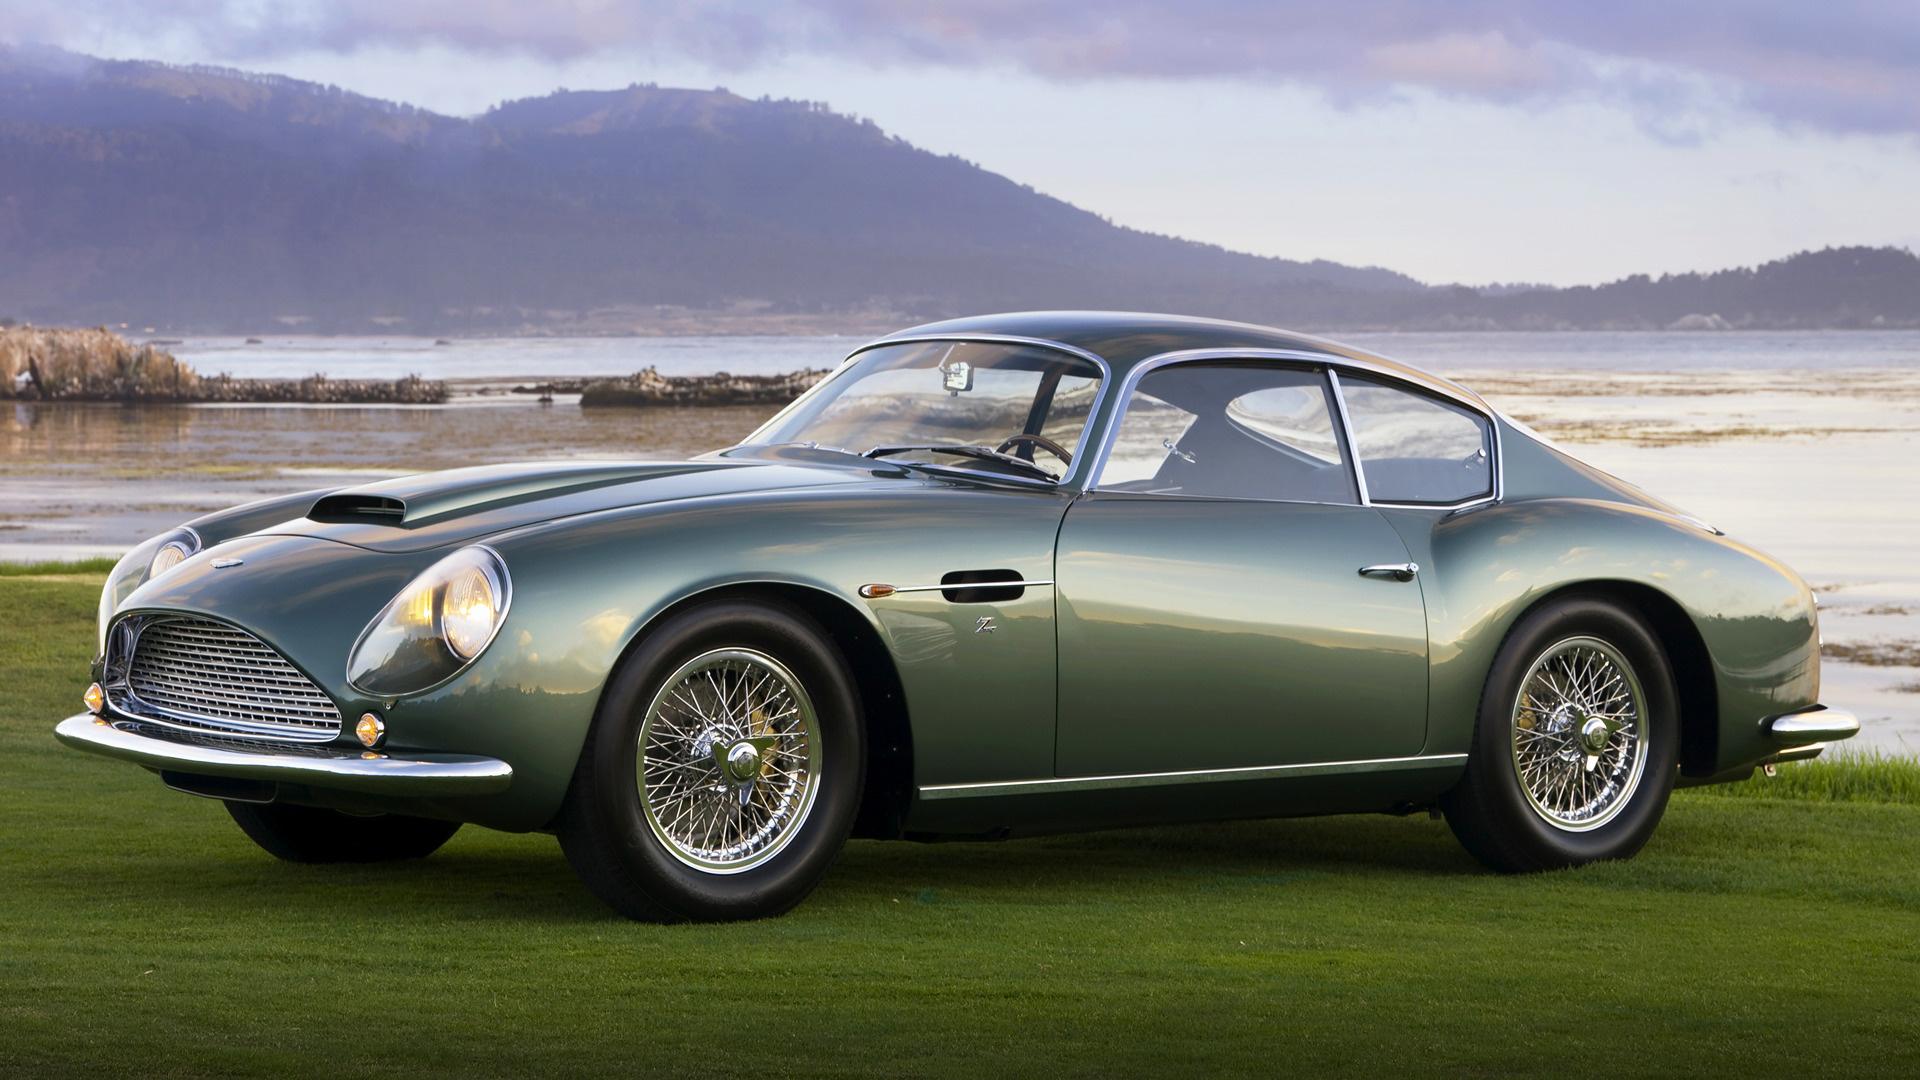 1960 Aston Martin Db4 Gt Zagato Hintergrundbilder Und Wallpaper In Hd Car Pixel